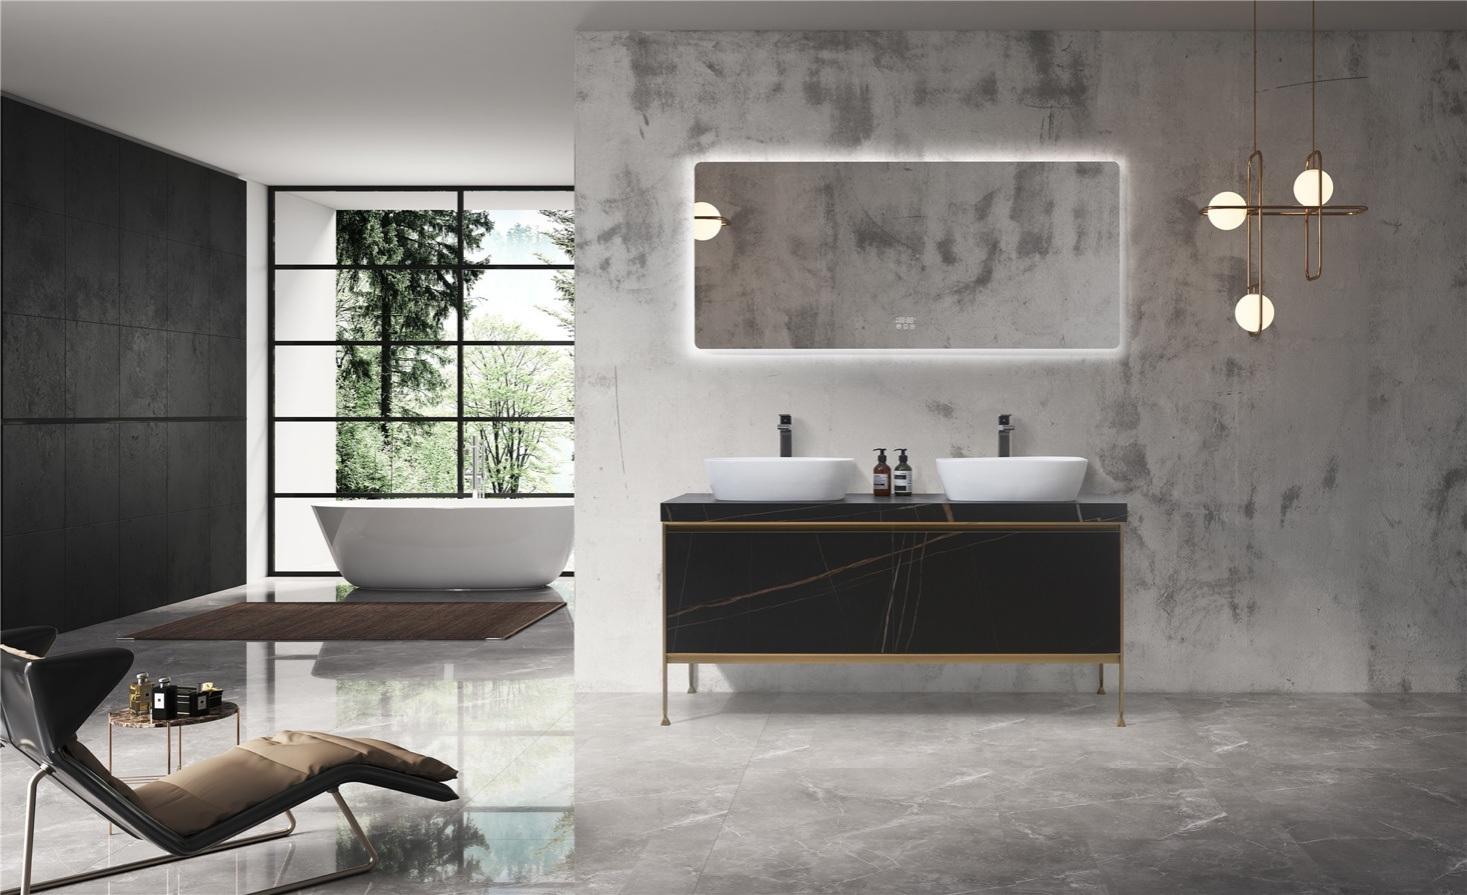 China Luxury Double Wash Basin Modern Free Standing Bathroom Vanity Cabinet 7615 China Bathroom Vanity Bathroom Cabinet